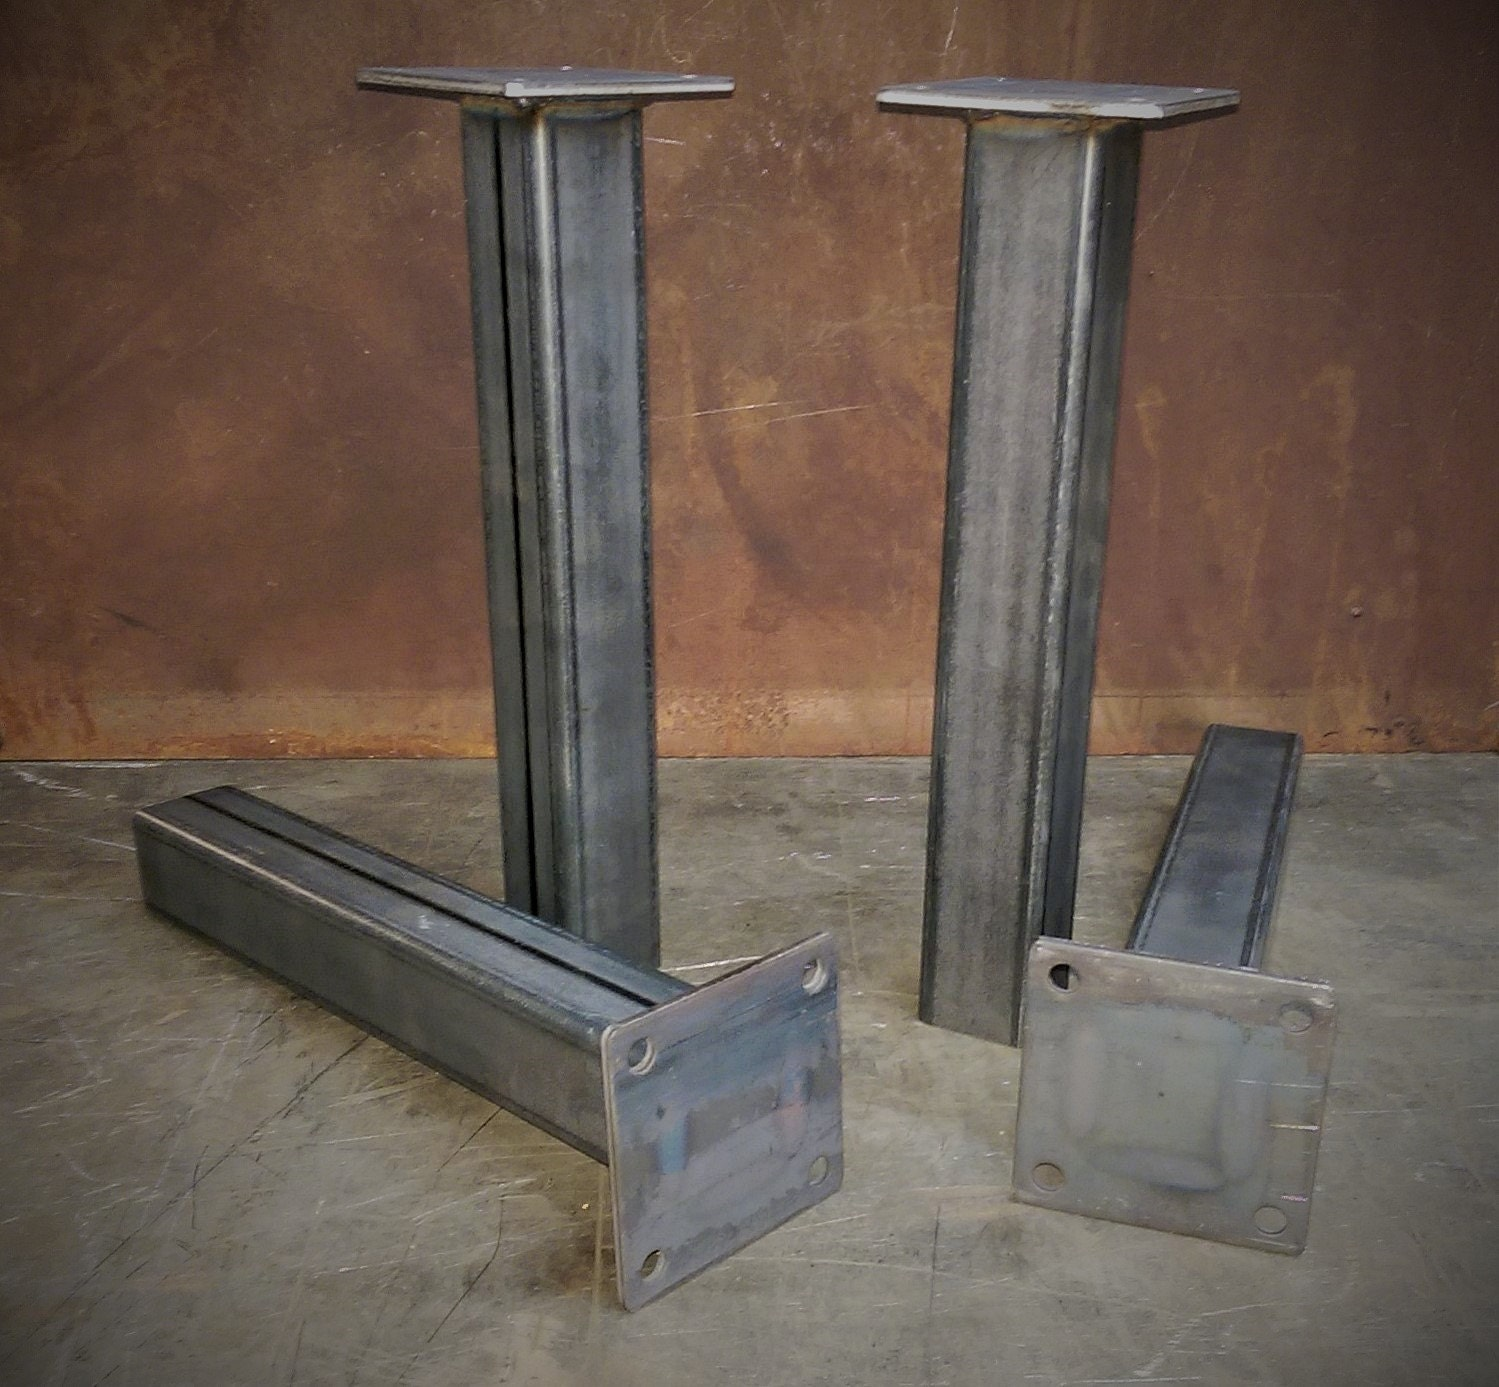 Square Coffee Table Metal Legs: Metal Tube Table Legs Set Of 4 1228height